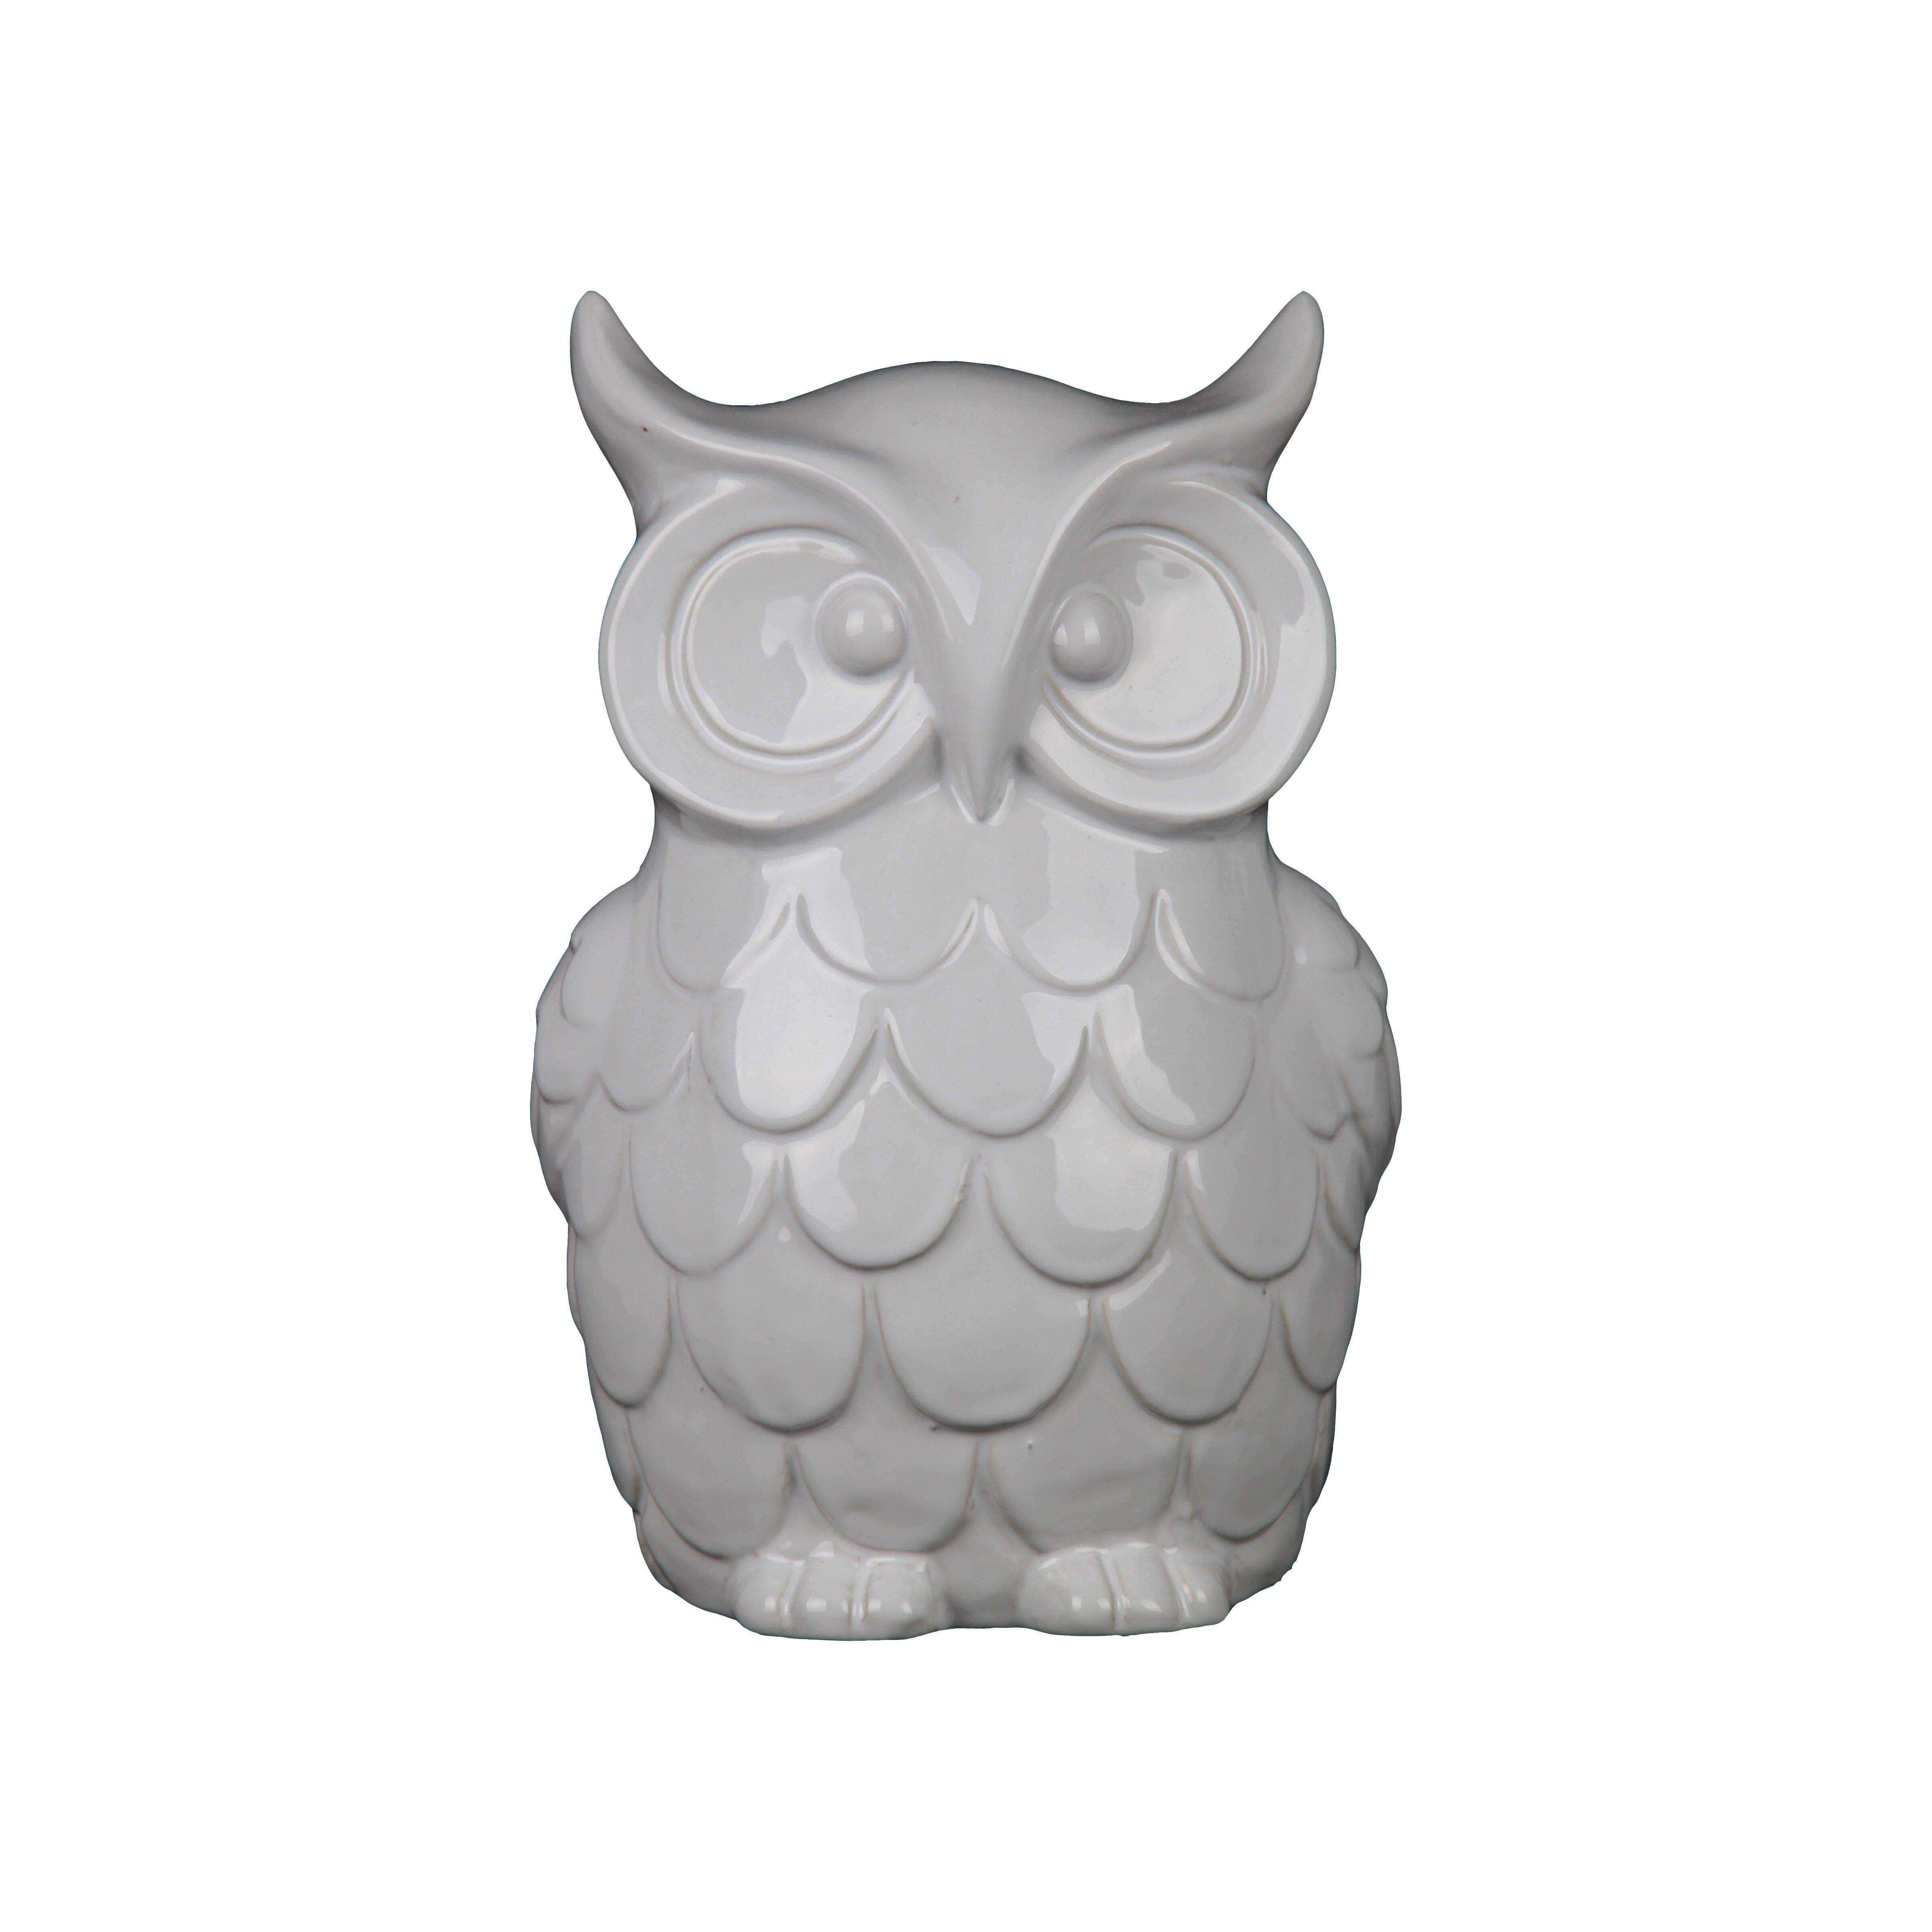 Privilege Ceramic White Owl Figurine Reviews Wayfair